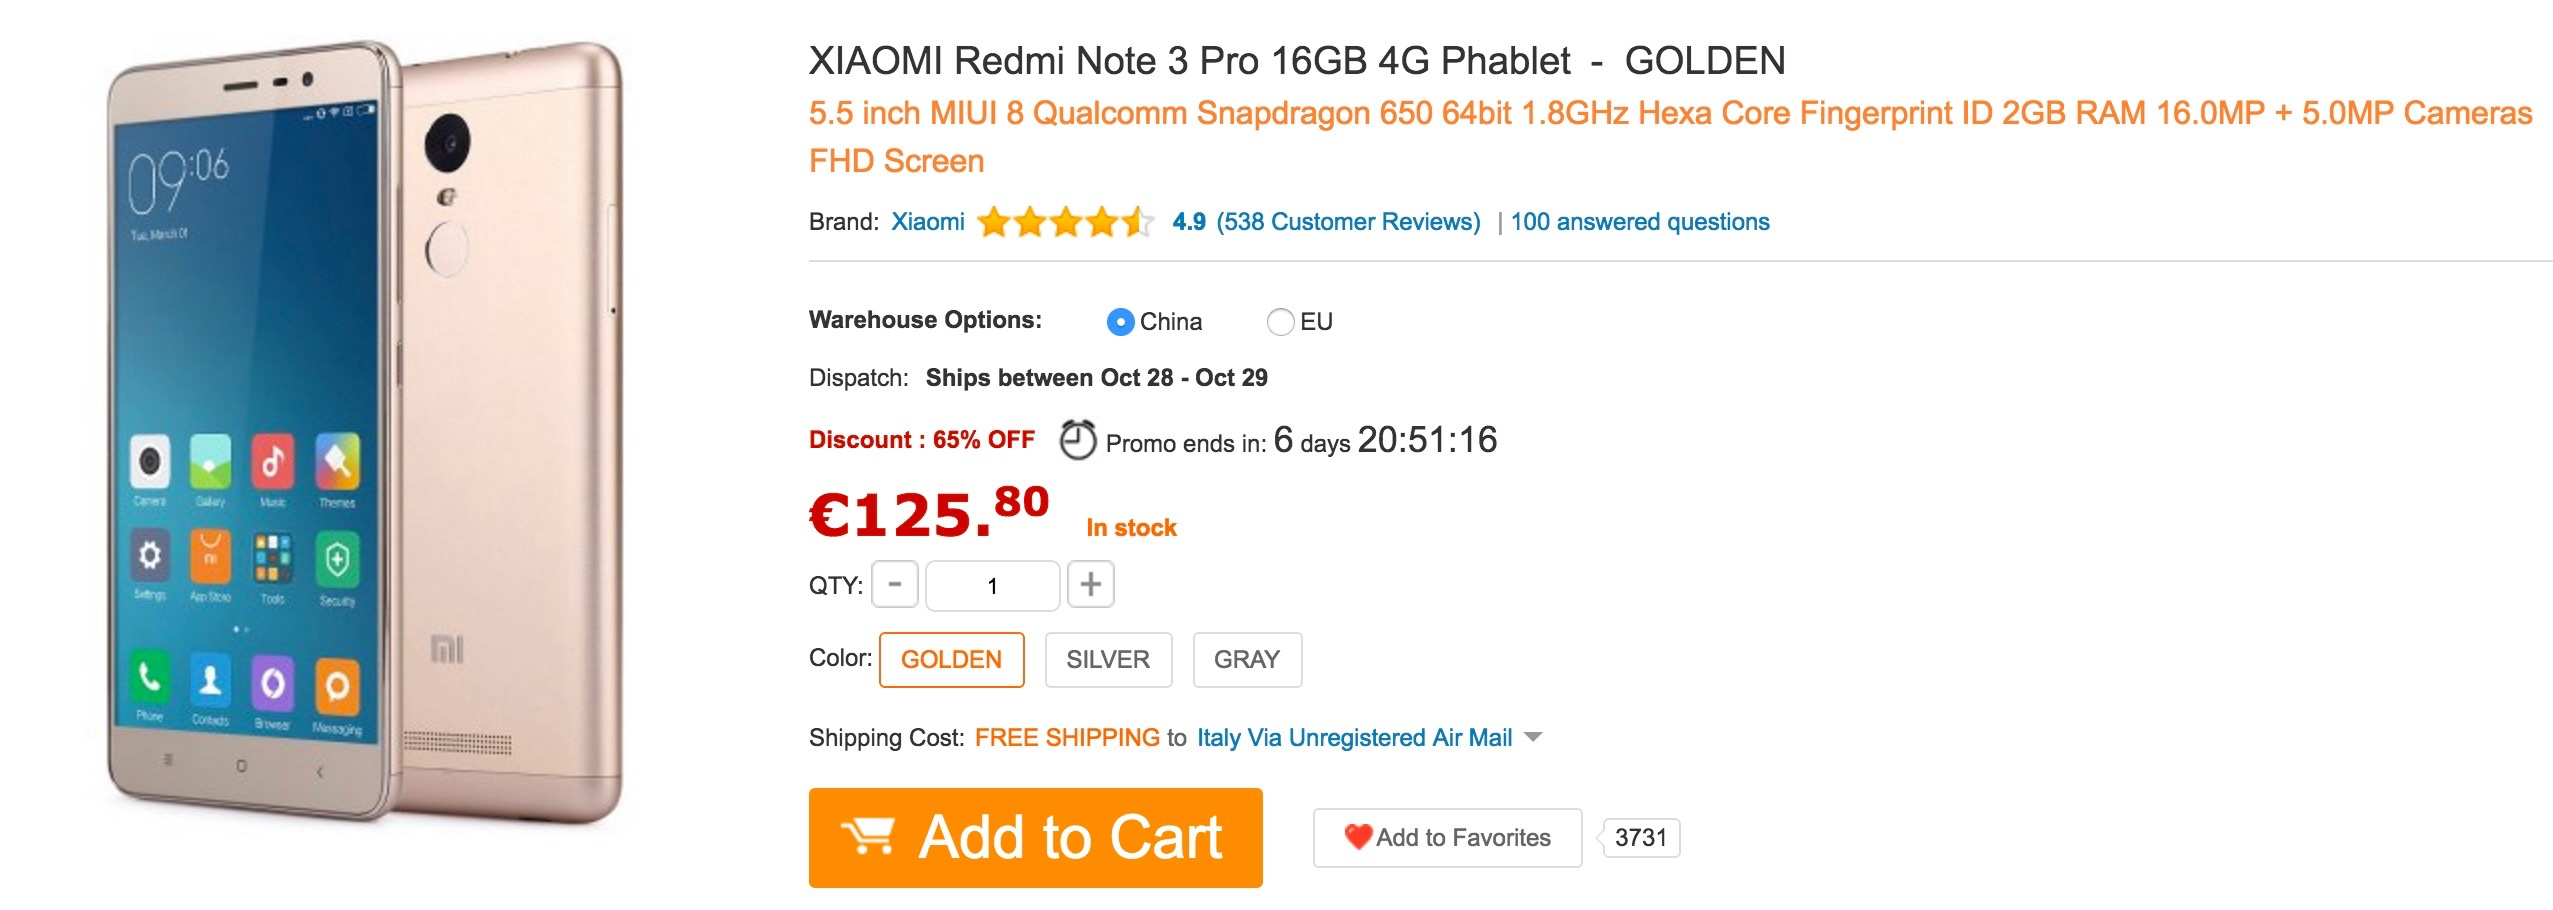 GearBest - Xiaomi Redmi Note 3 Pro